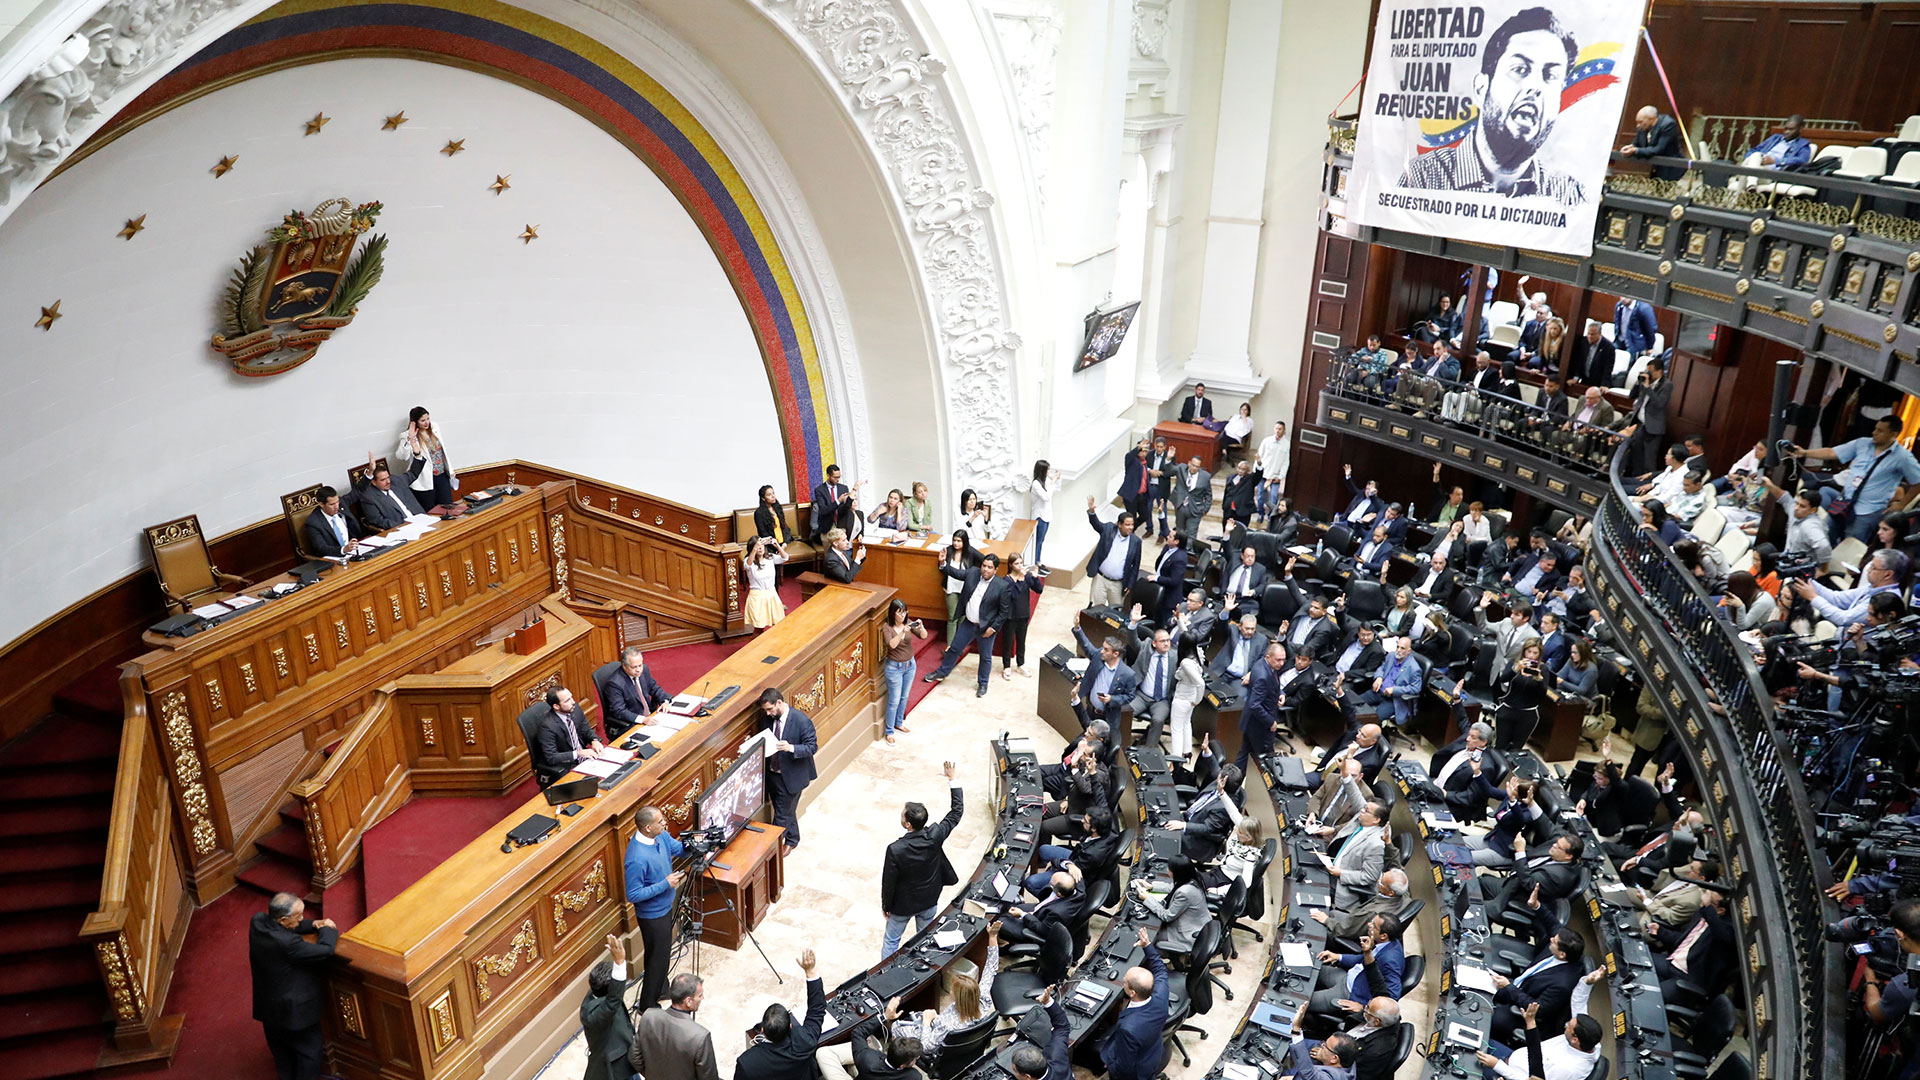 yammine_chery_cheryl_blossom_brother_la_asamblea_nacional_de_venezuela_declaro_a_maduro_usurpador_de_la_presidencia_.jpg